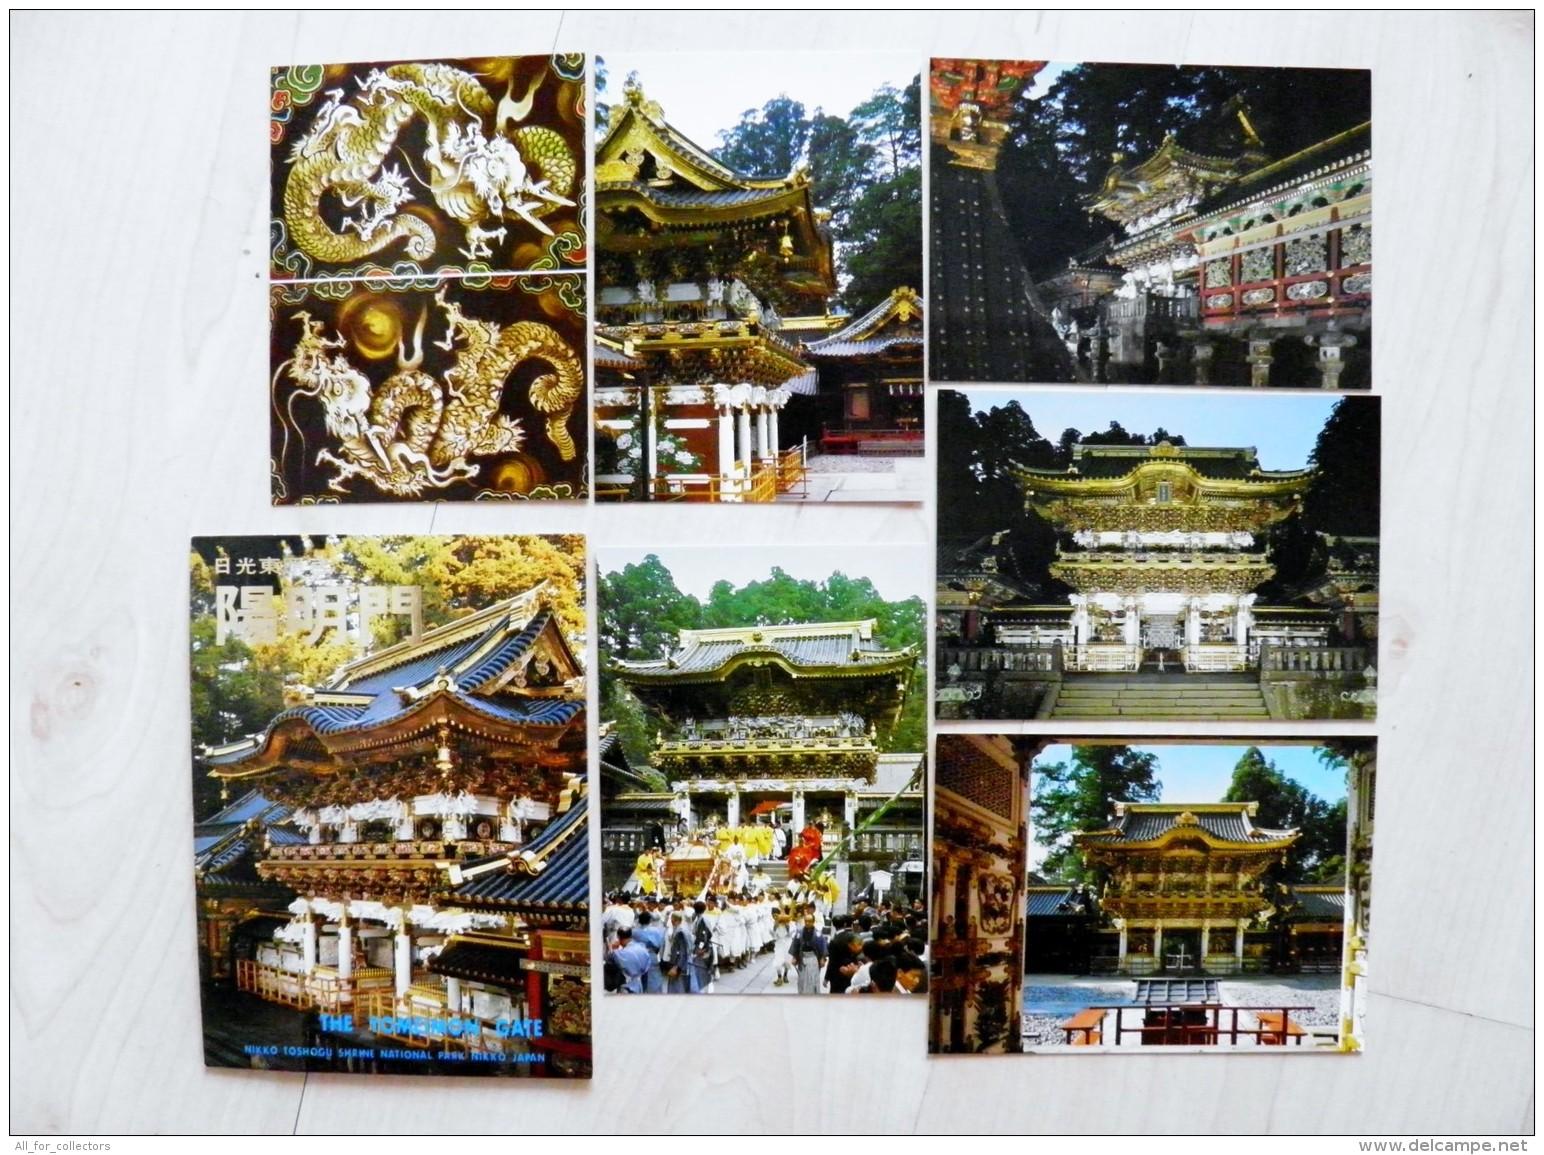 Set Of 6 Post Cards In Folder From Japan The Yomeimon Gate National Park Nikko - Japon